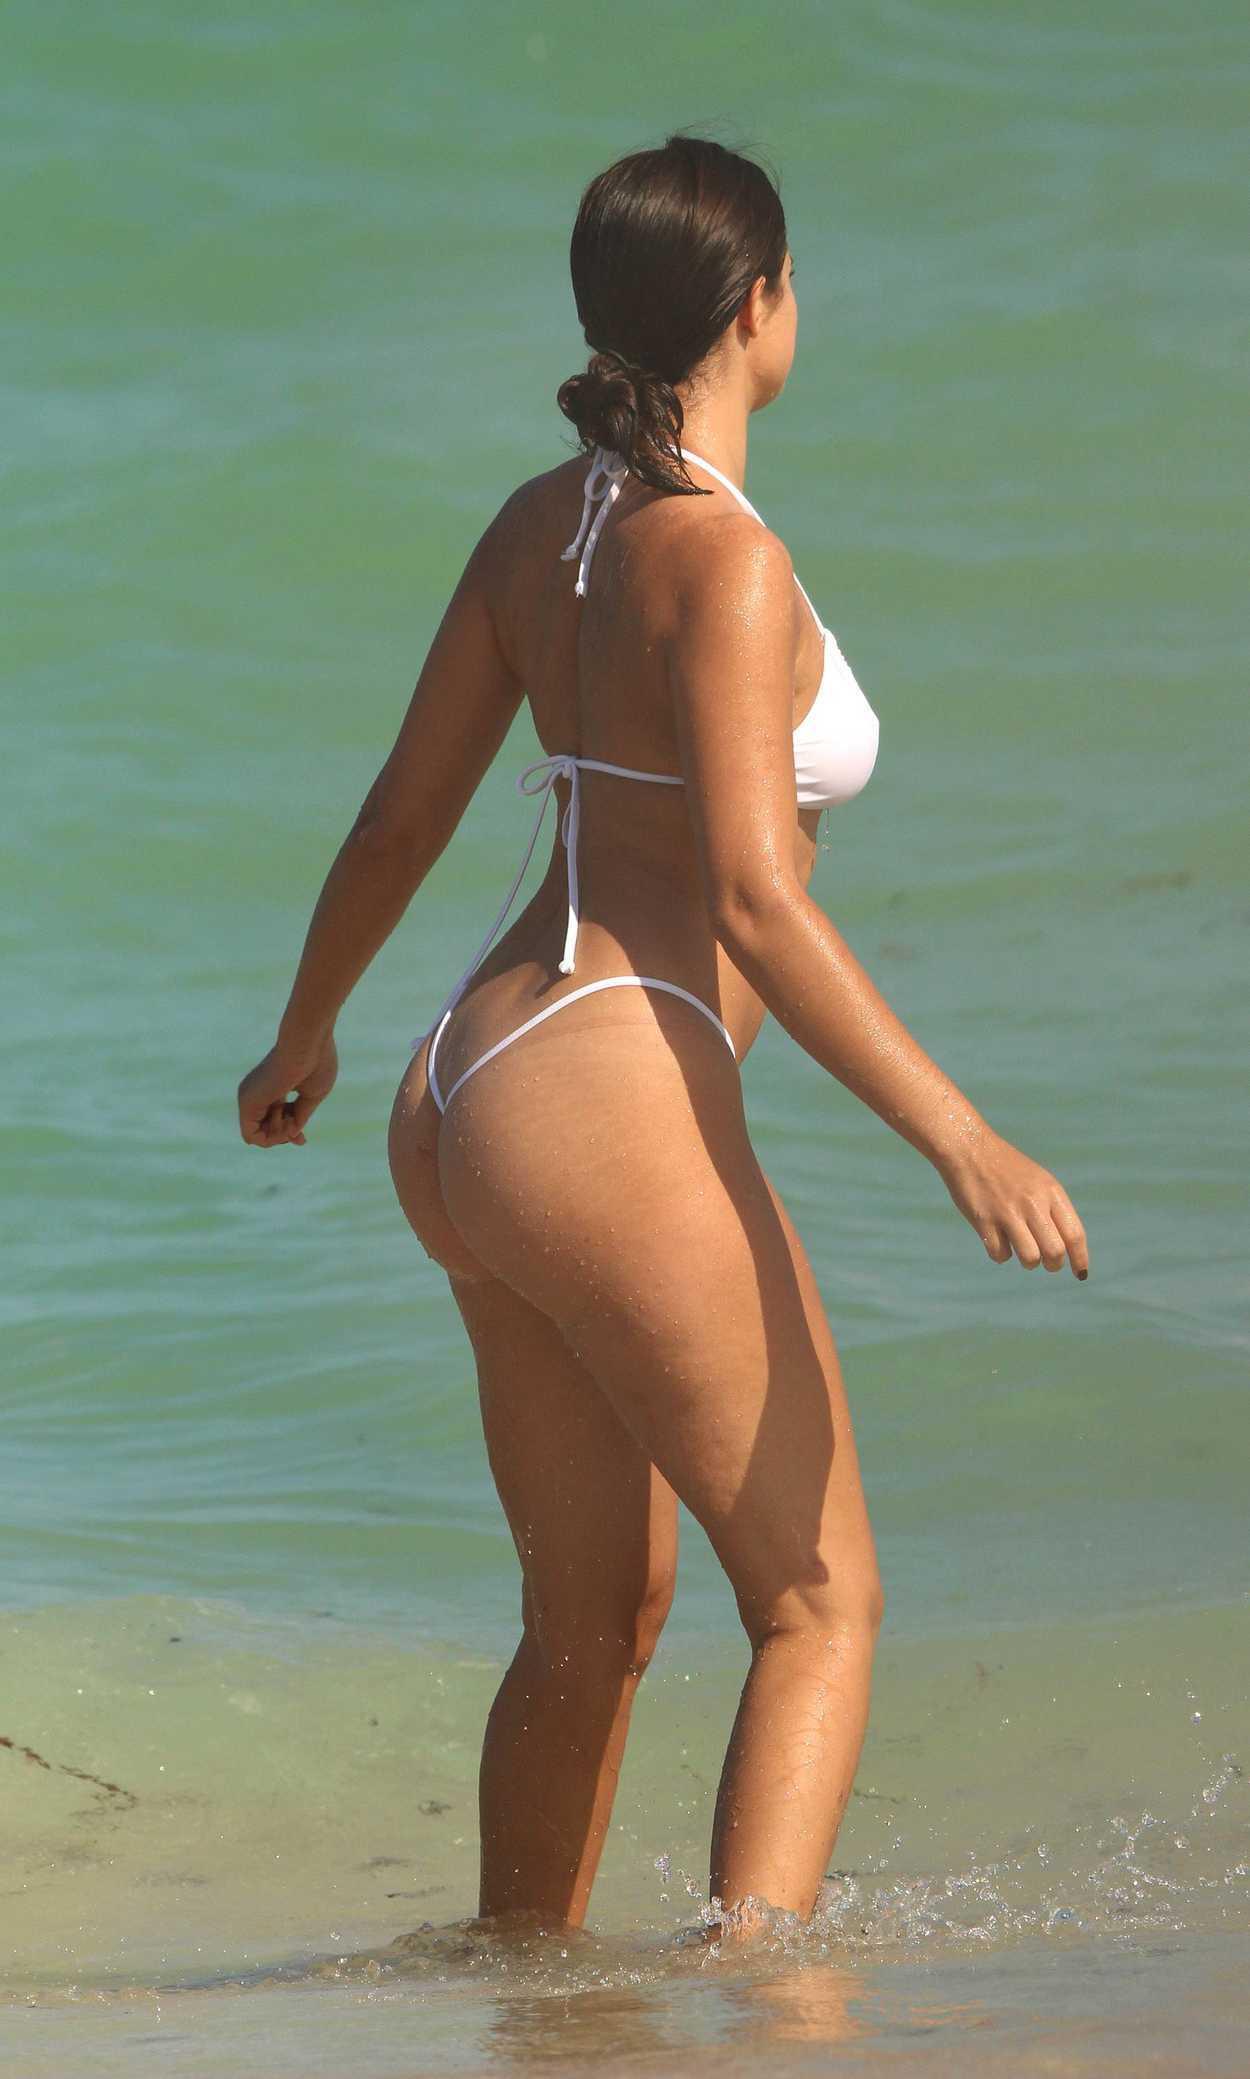 Tao Wickrath in a White Bikini on Miami Beach 2 Pic 8 of 35